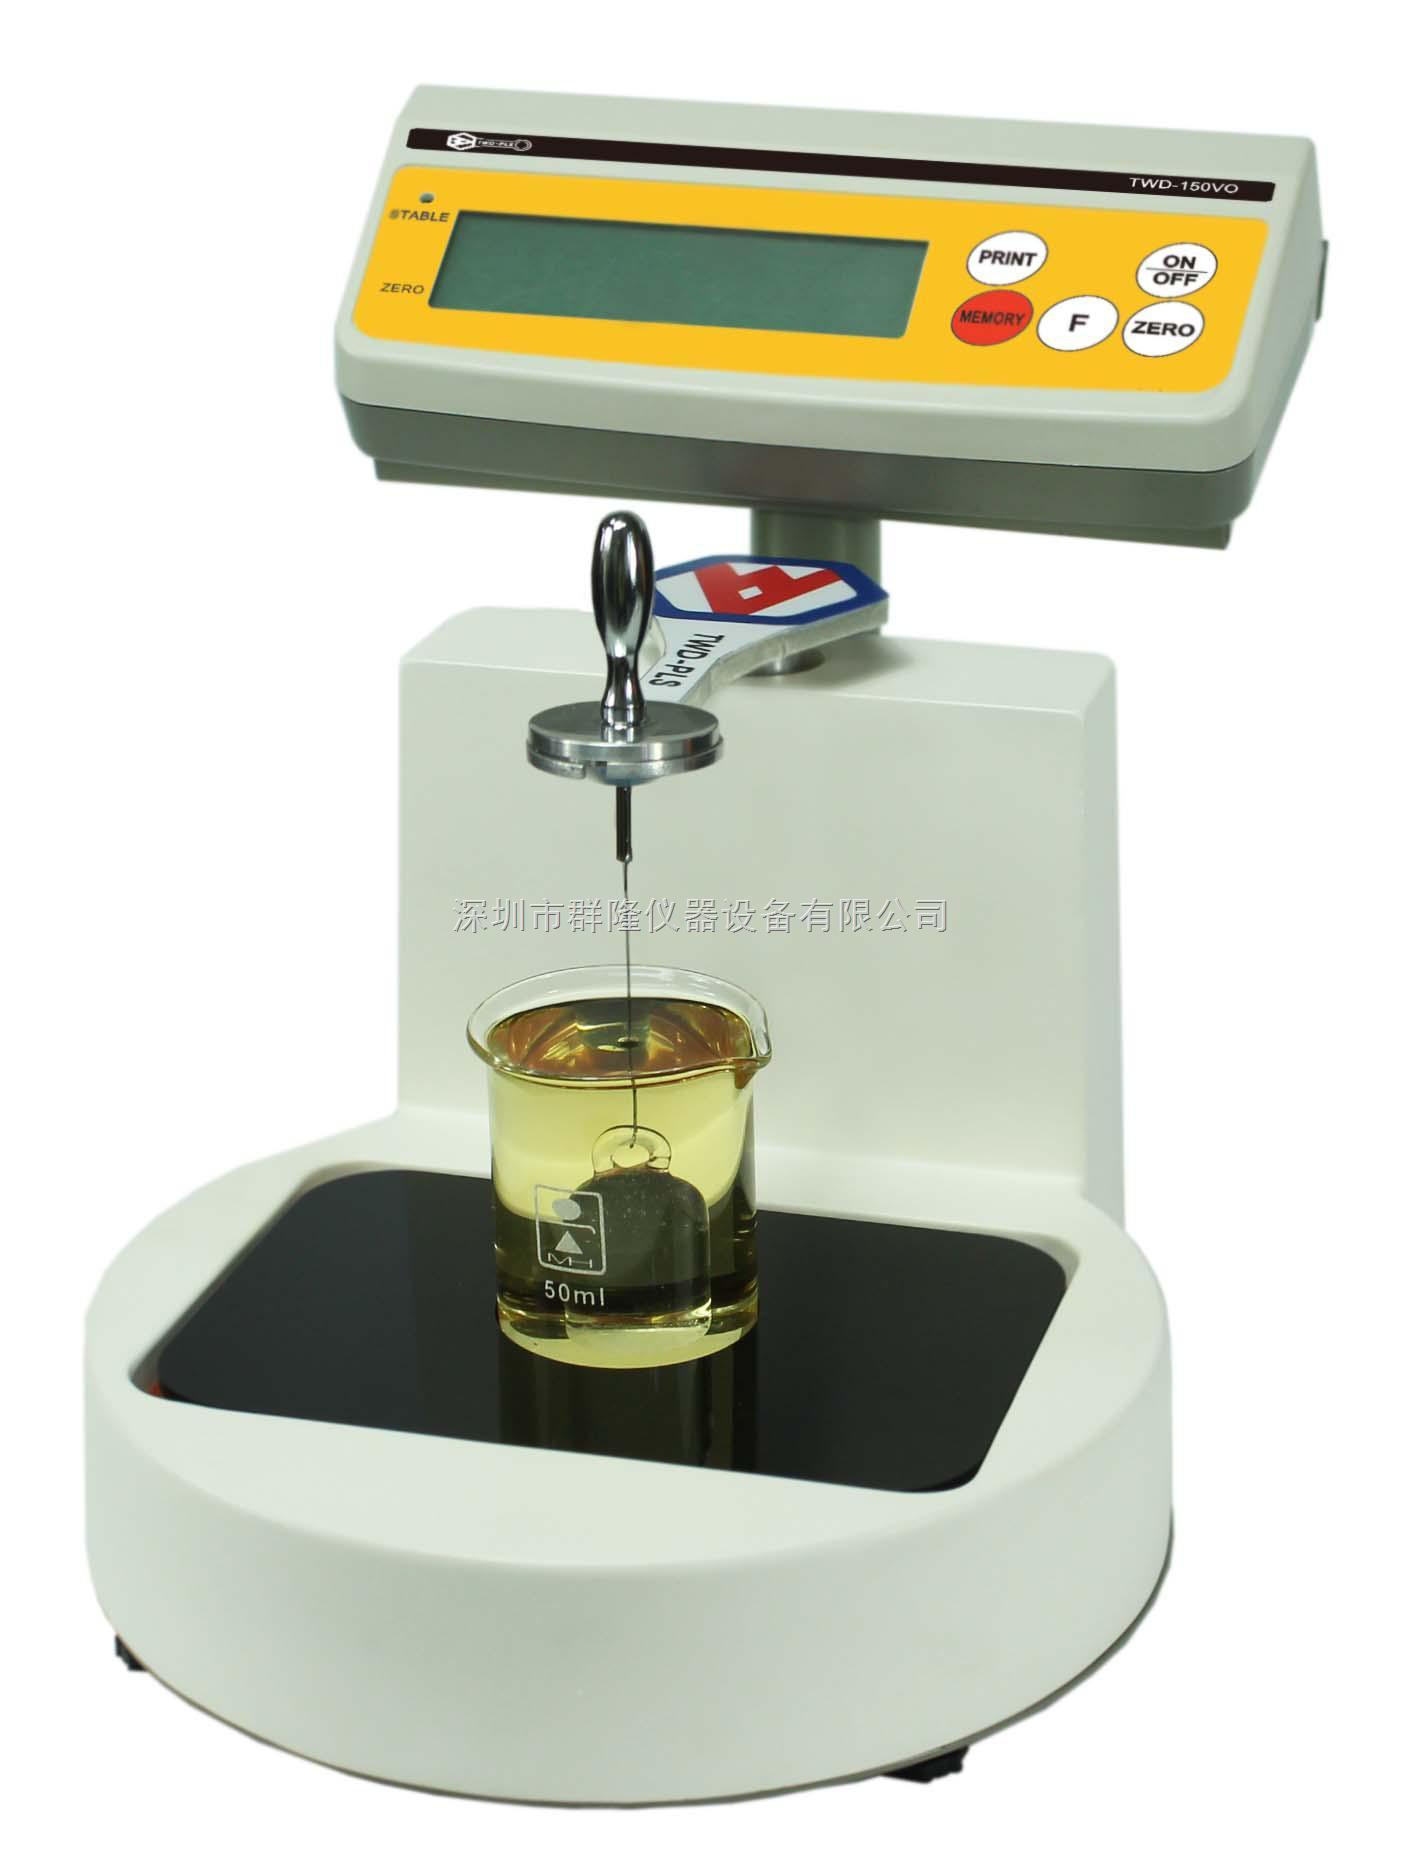 MZ-150VO 植物油相对密度、浓度测试仪